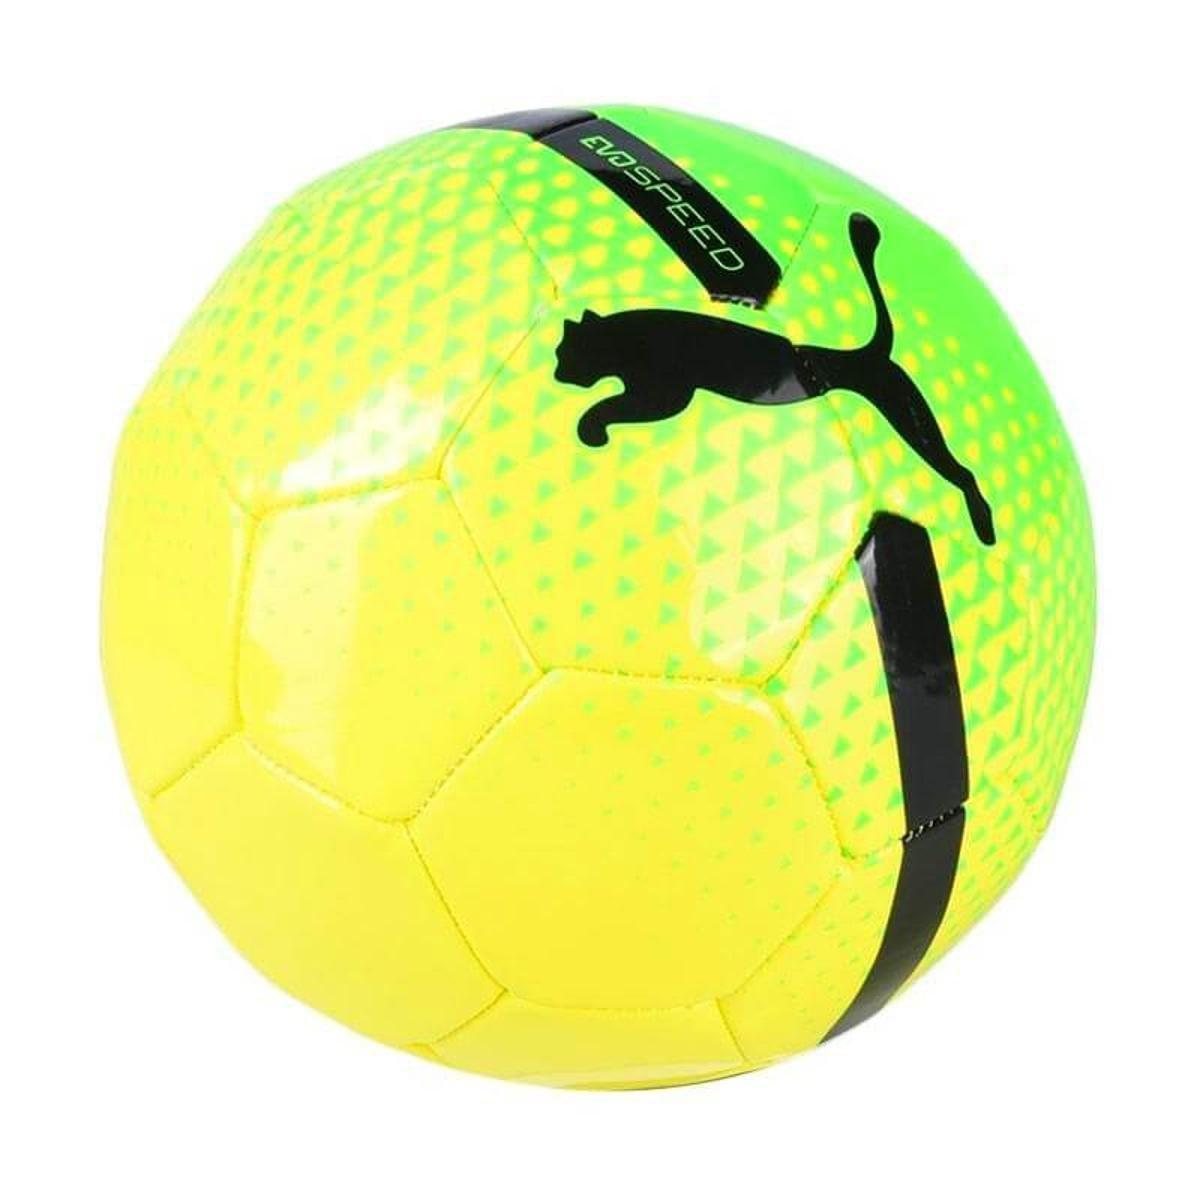 Bola Puma EvoSpeed Sala Ball Futsal - Compre Agora  a7889d2b42146